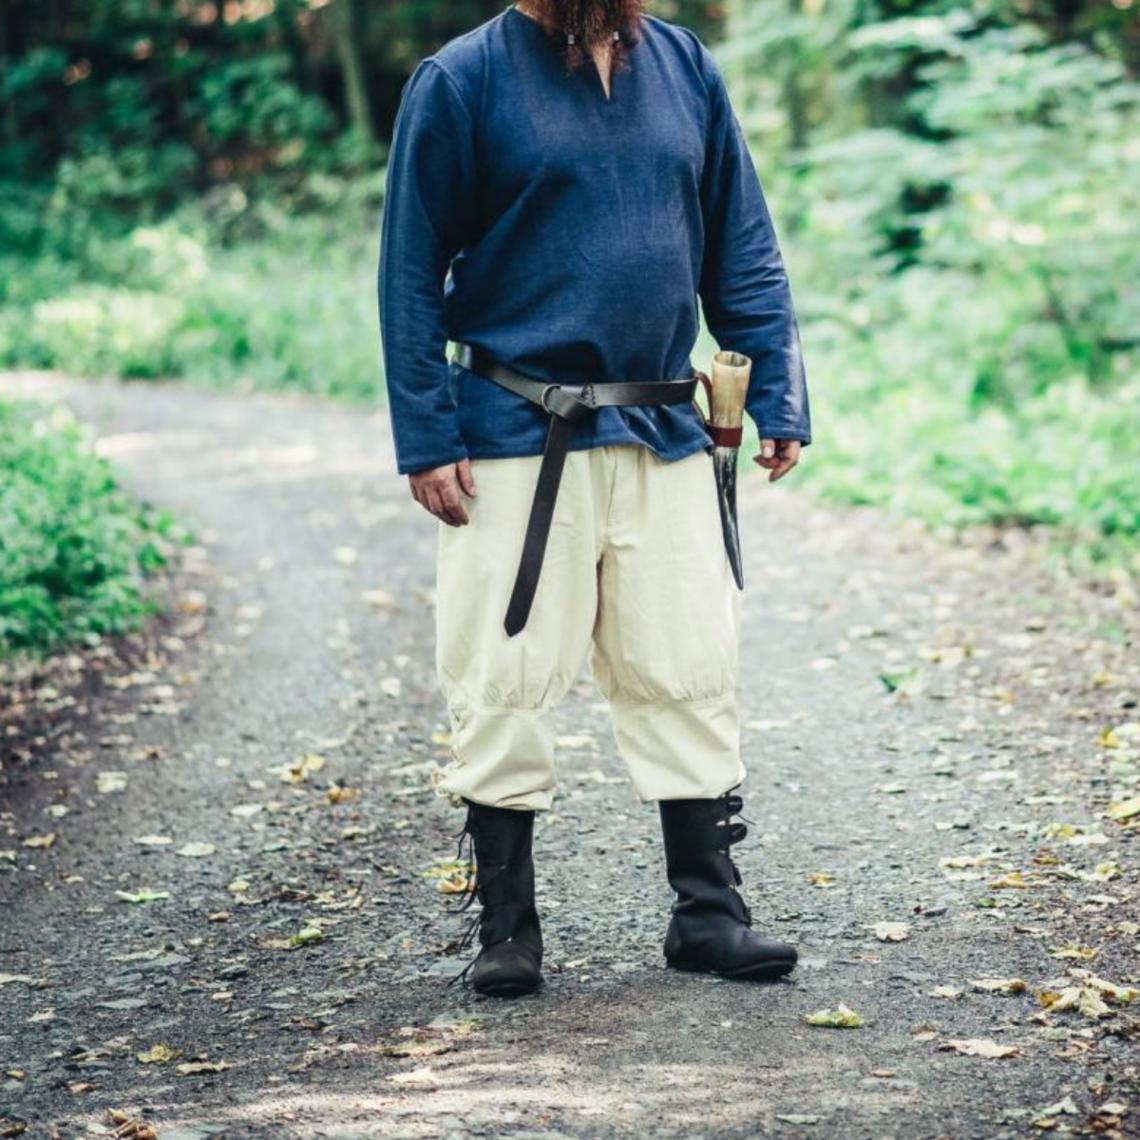 Leonardo Carbone Pantalon vikingo Dublin, natural